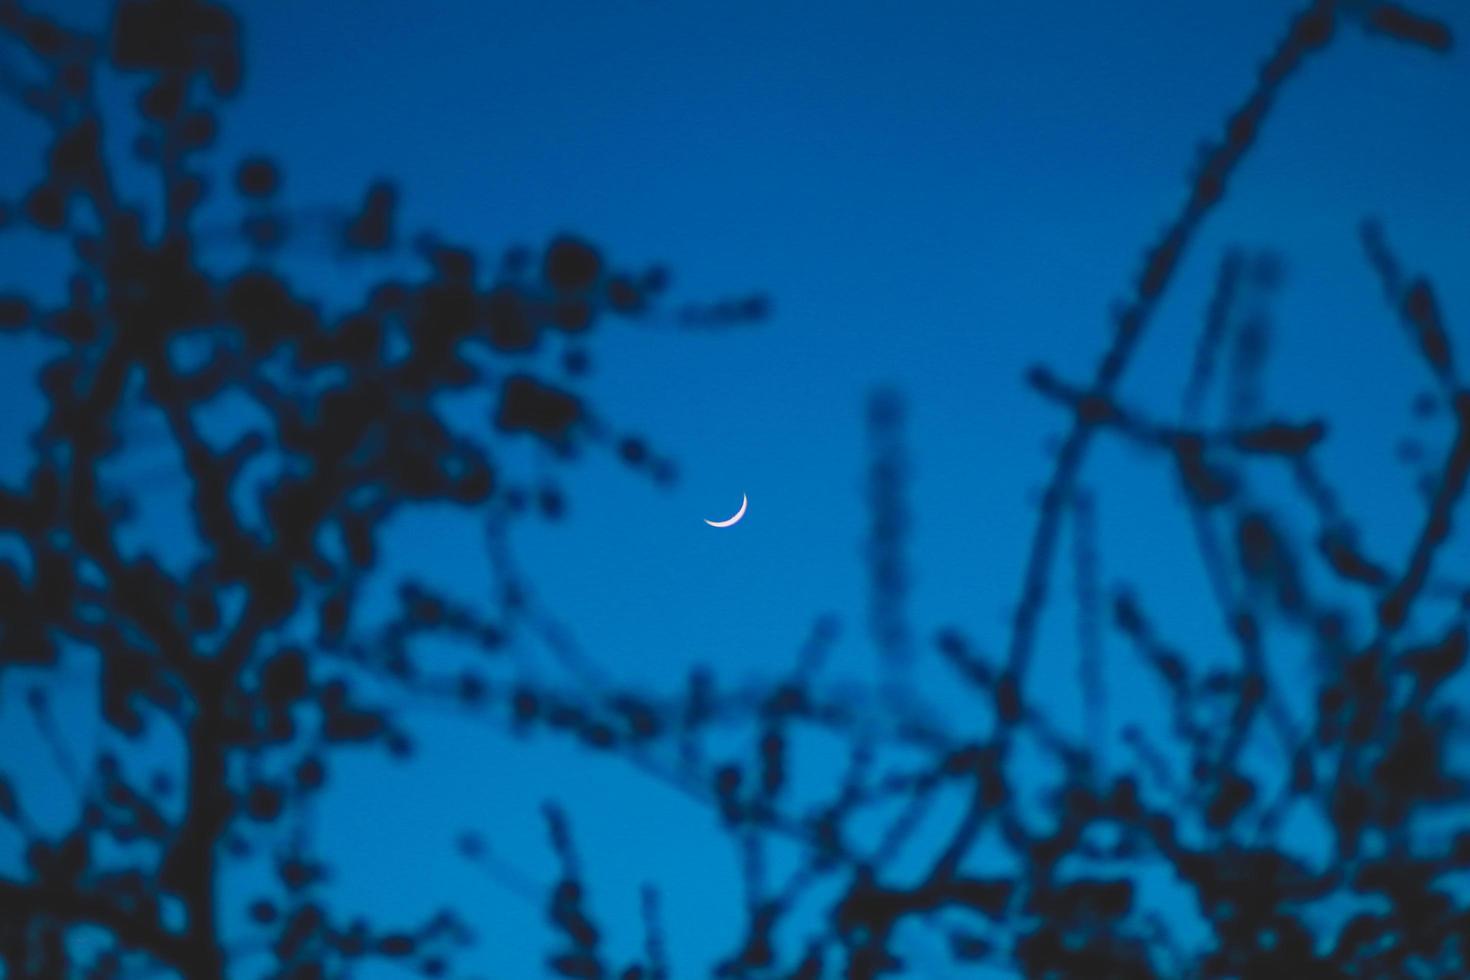 Waxing crescent moon photo